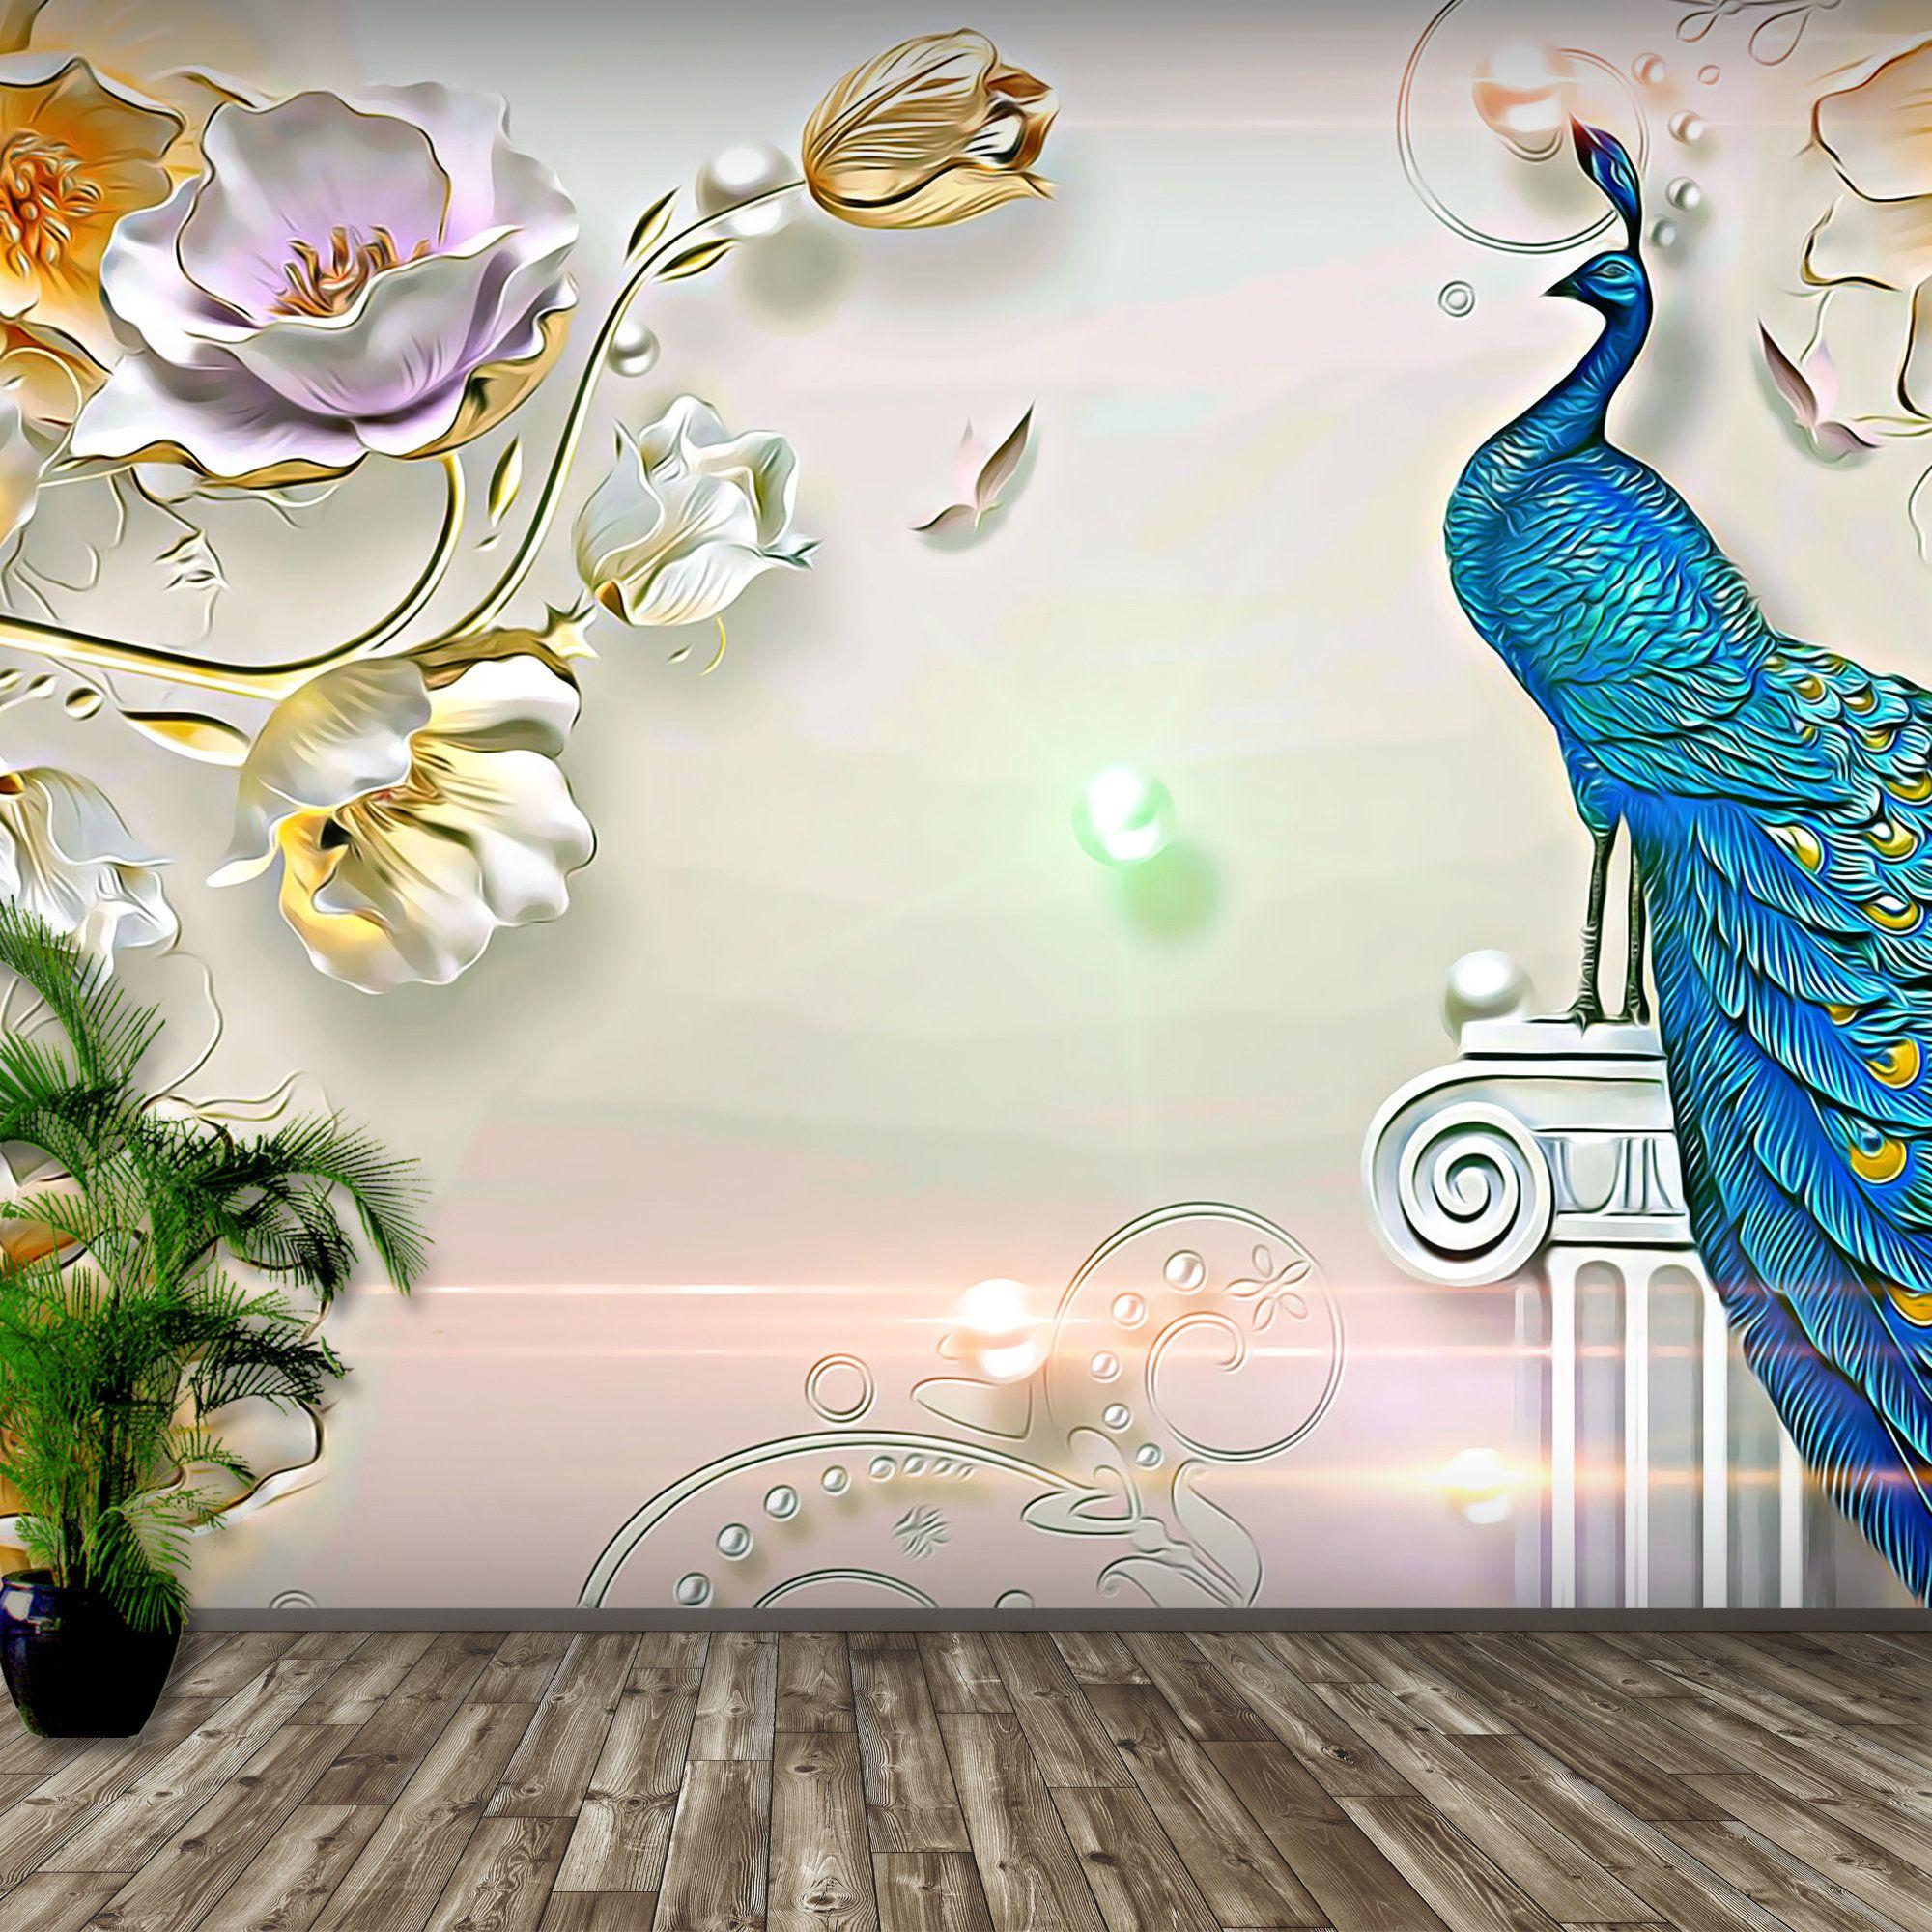 Peacock Wallpaper Removable Wallpaper Wall Mural Peel Etsy Wallpaper Wall Wallpaper Removable Wallpaper